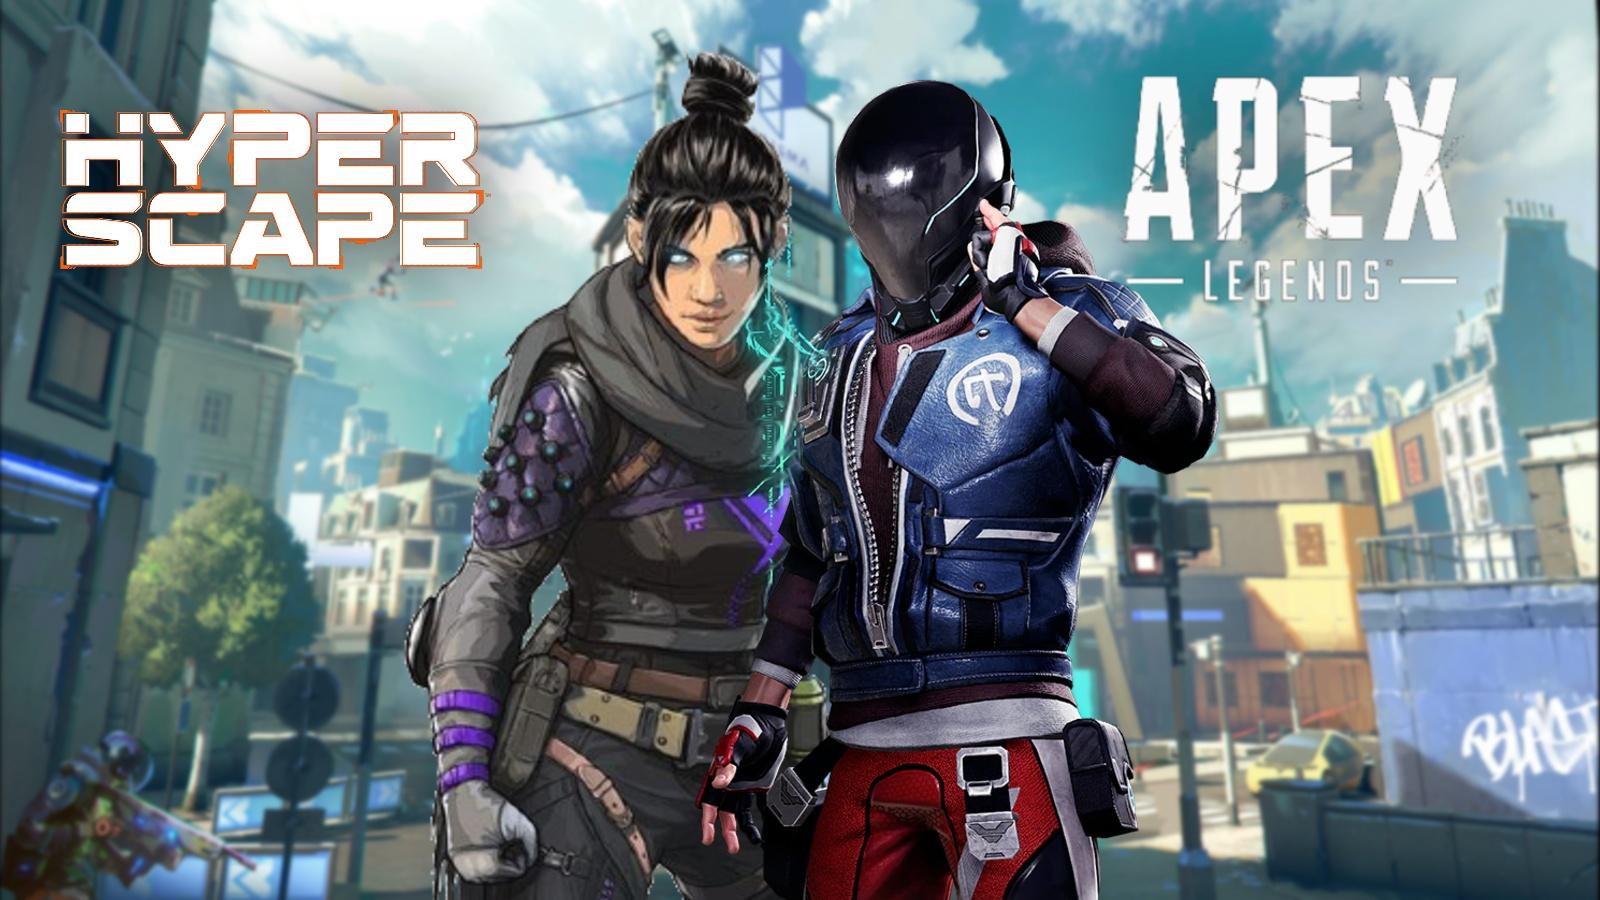 Hyper Scape Apex Legends crossover